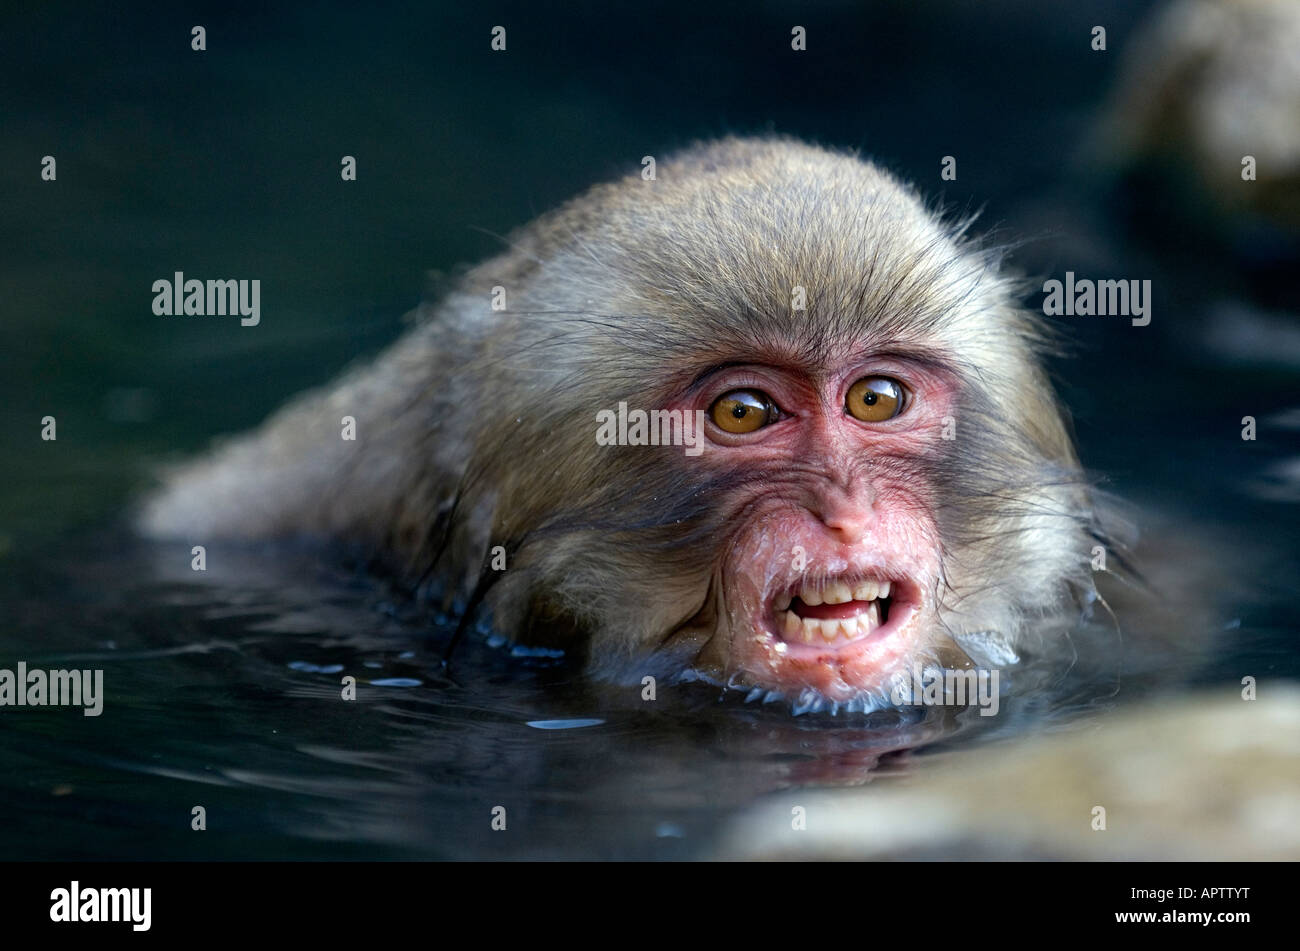 japanischen makaken baby macaca fuscata auszusetzen ihre z hne ver rgert beim baden in hei en. Black Bedroom Furniture Sets. Home Design Ideas